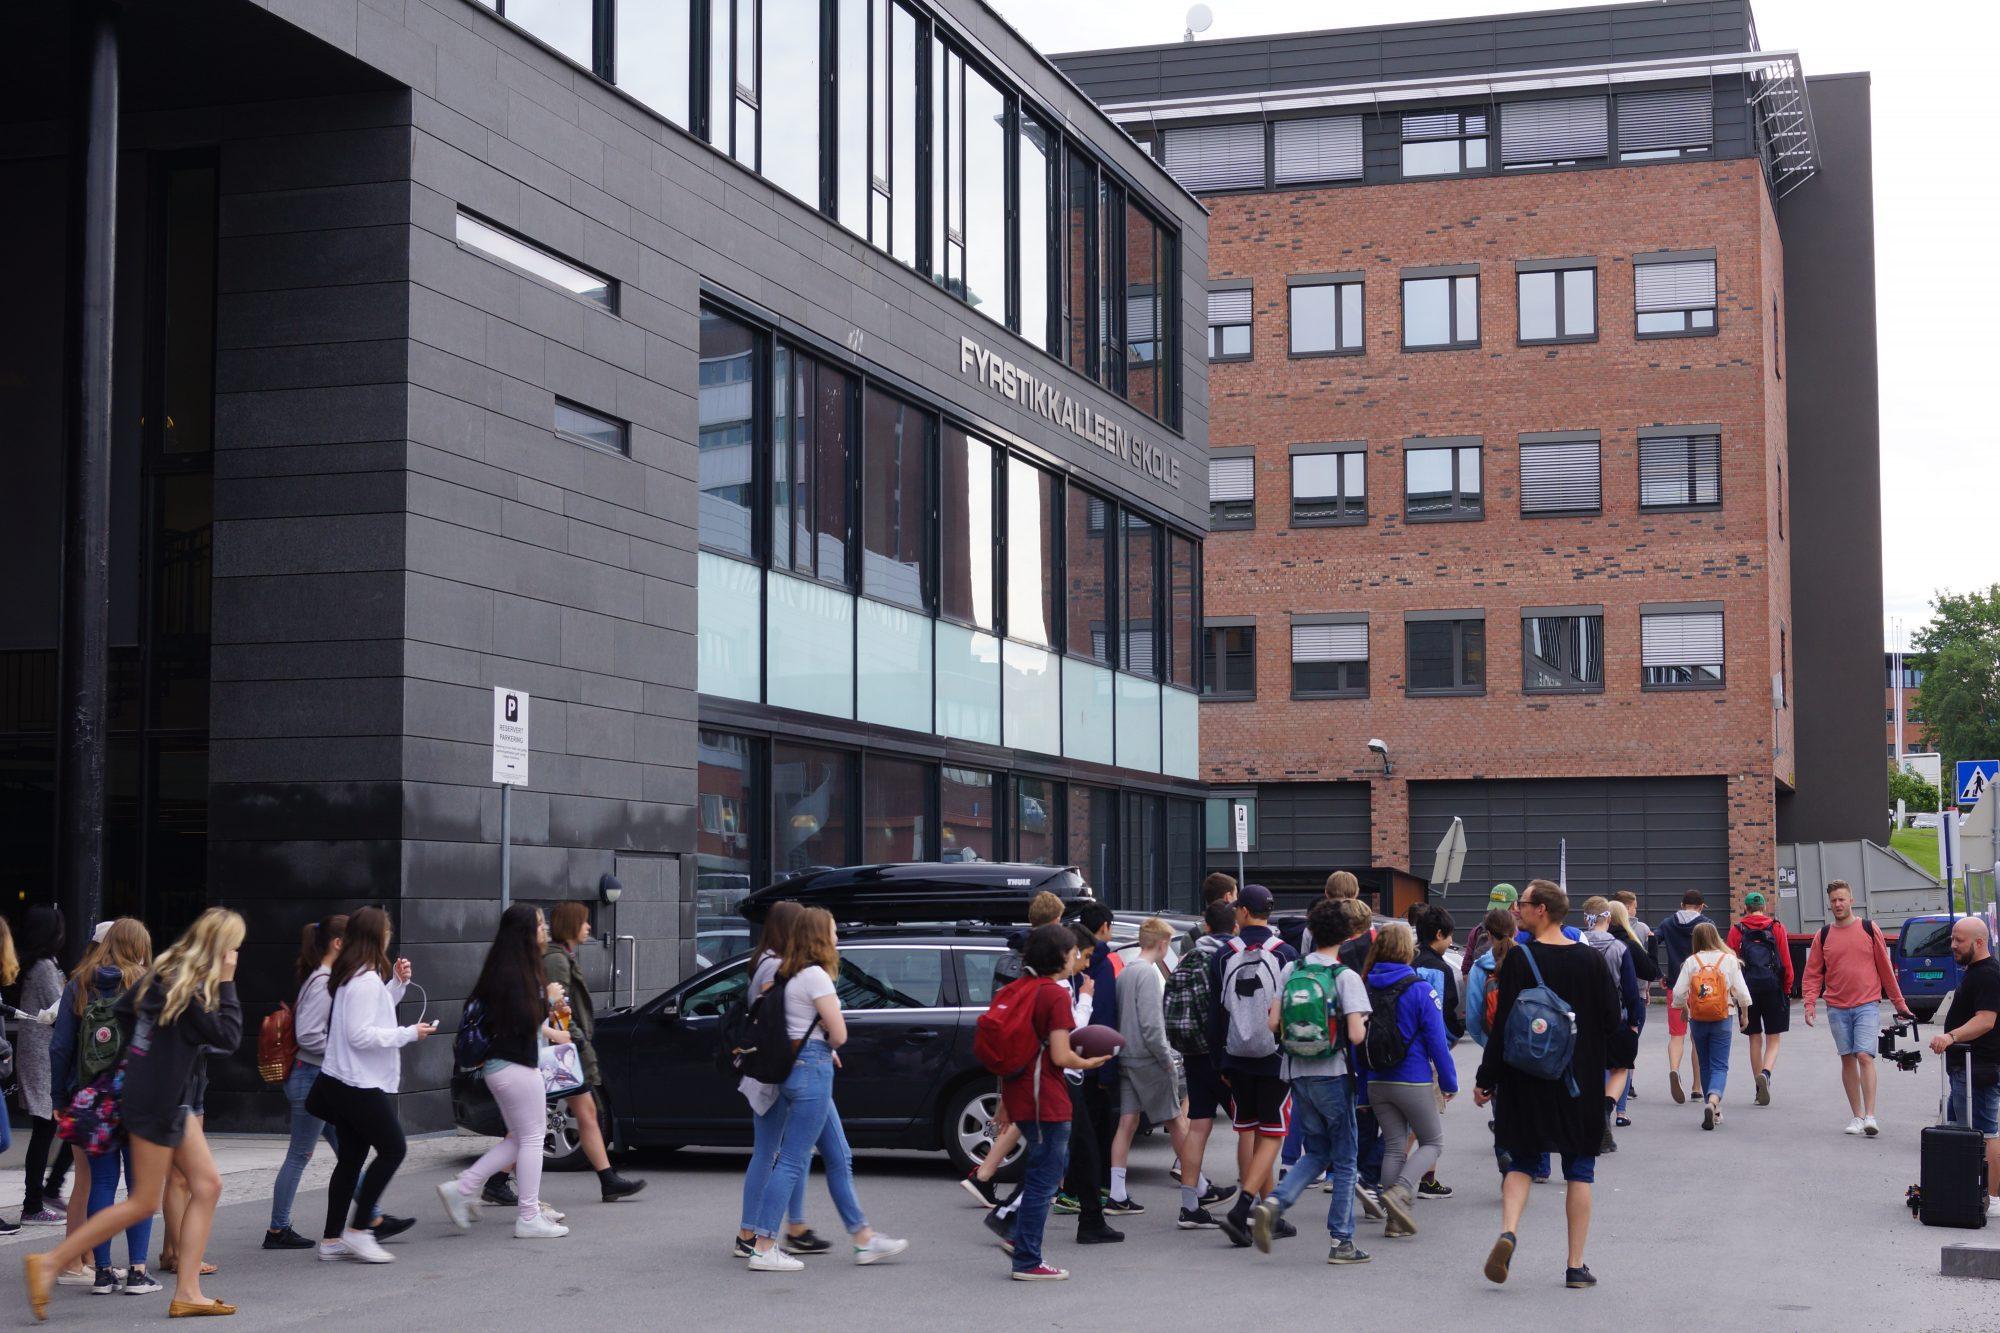 F21 Fyrstikkalleen skole, Helsfyr. Foto: Bryn-Helsfyr-samarbeidet